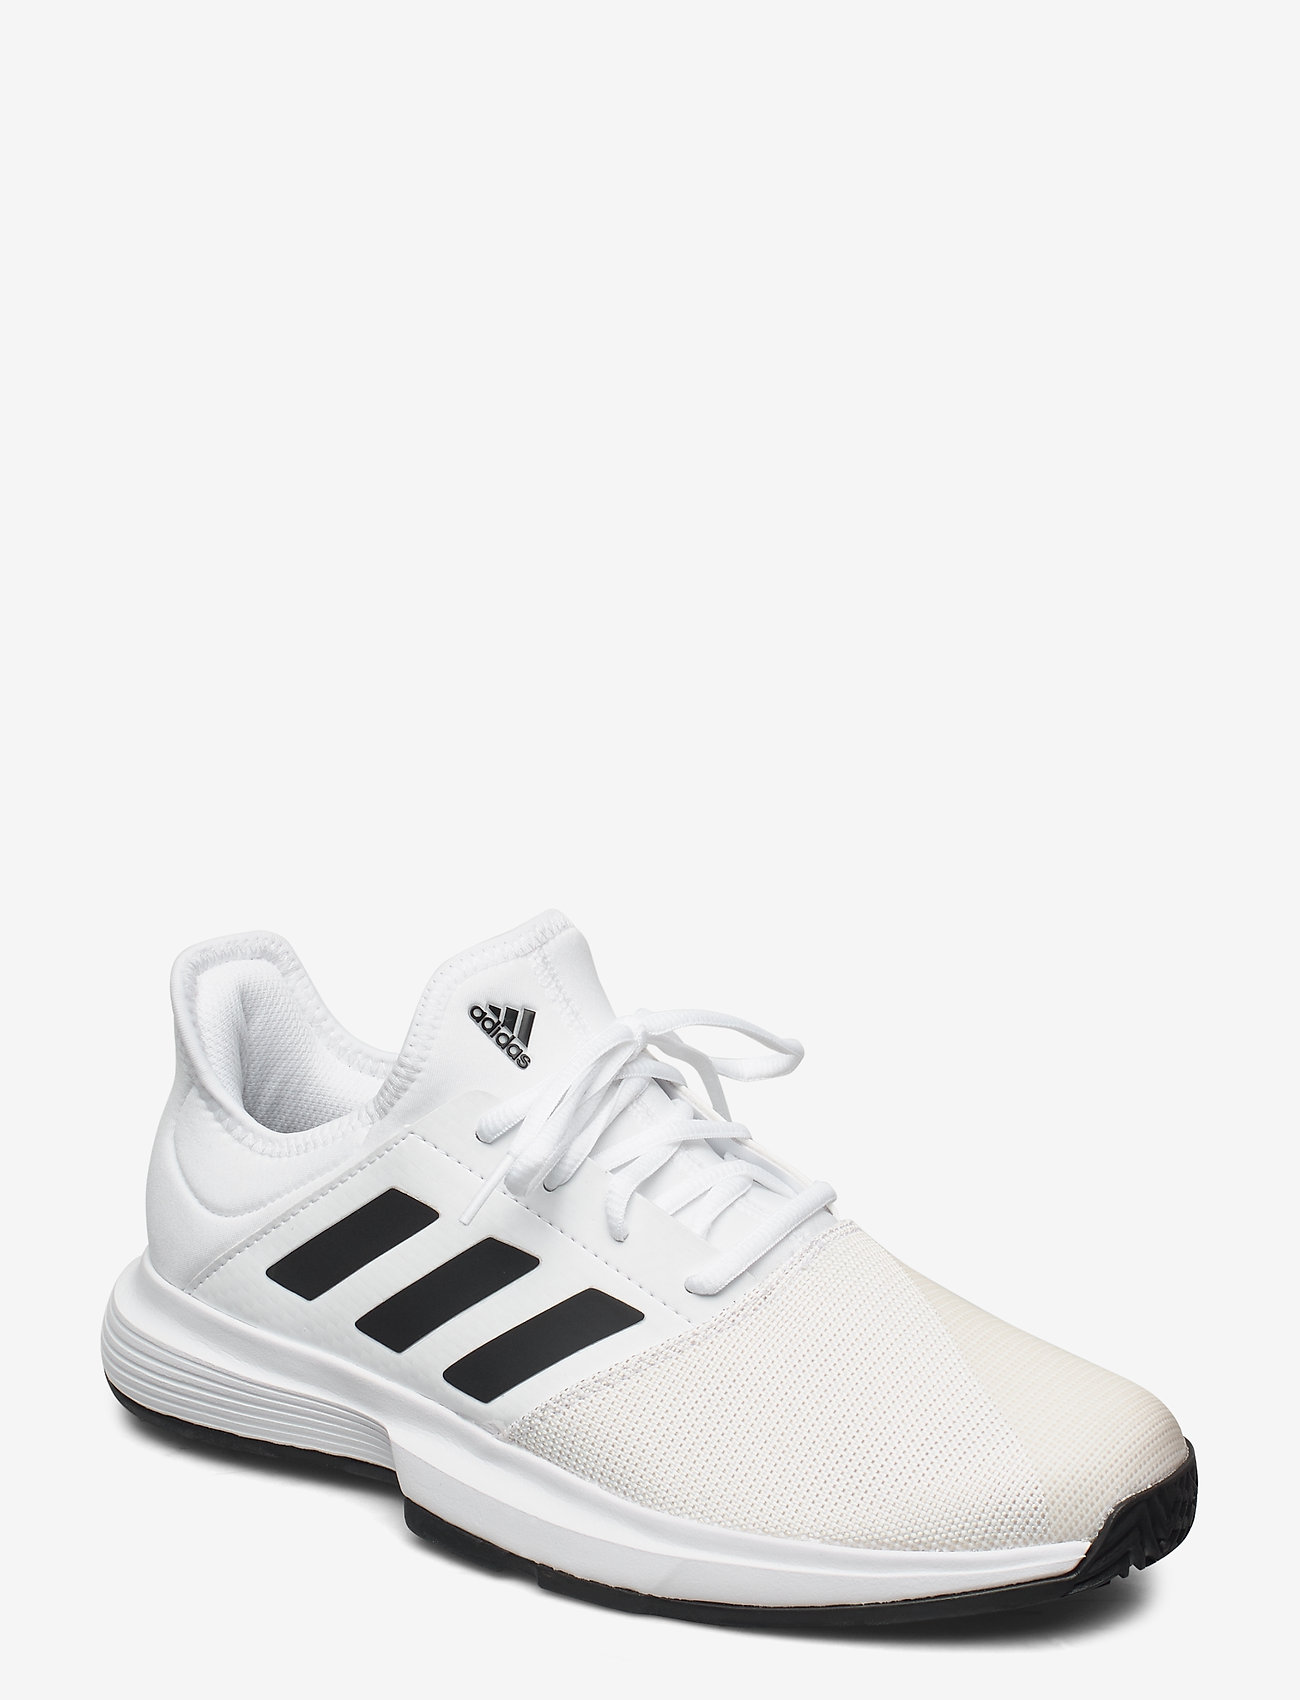 Gamecourt Multicourt Tennis Shoes